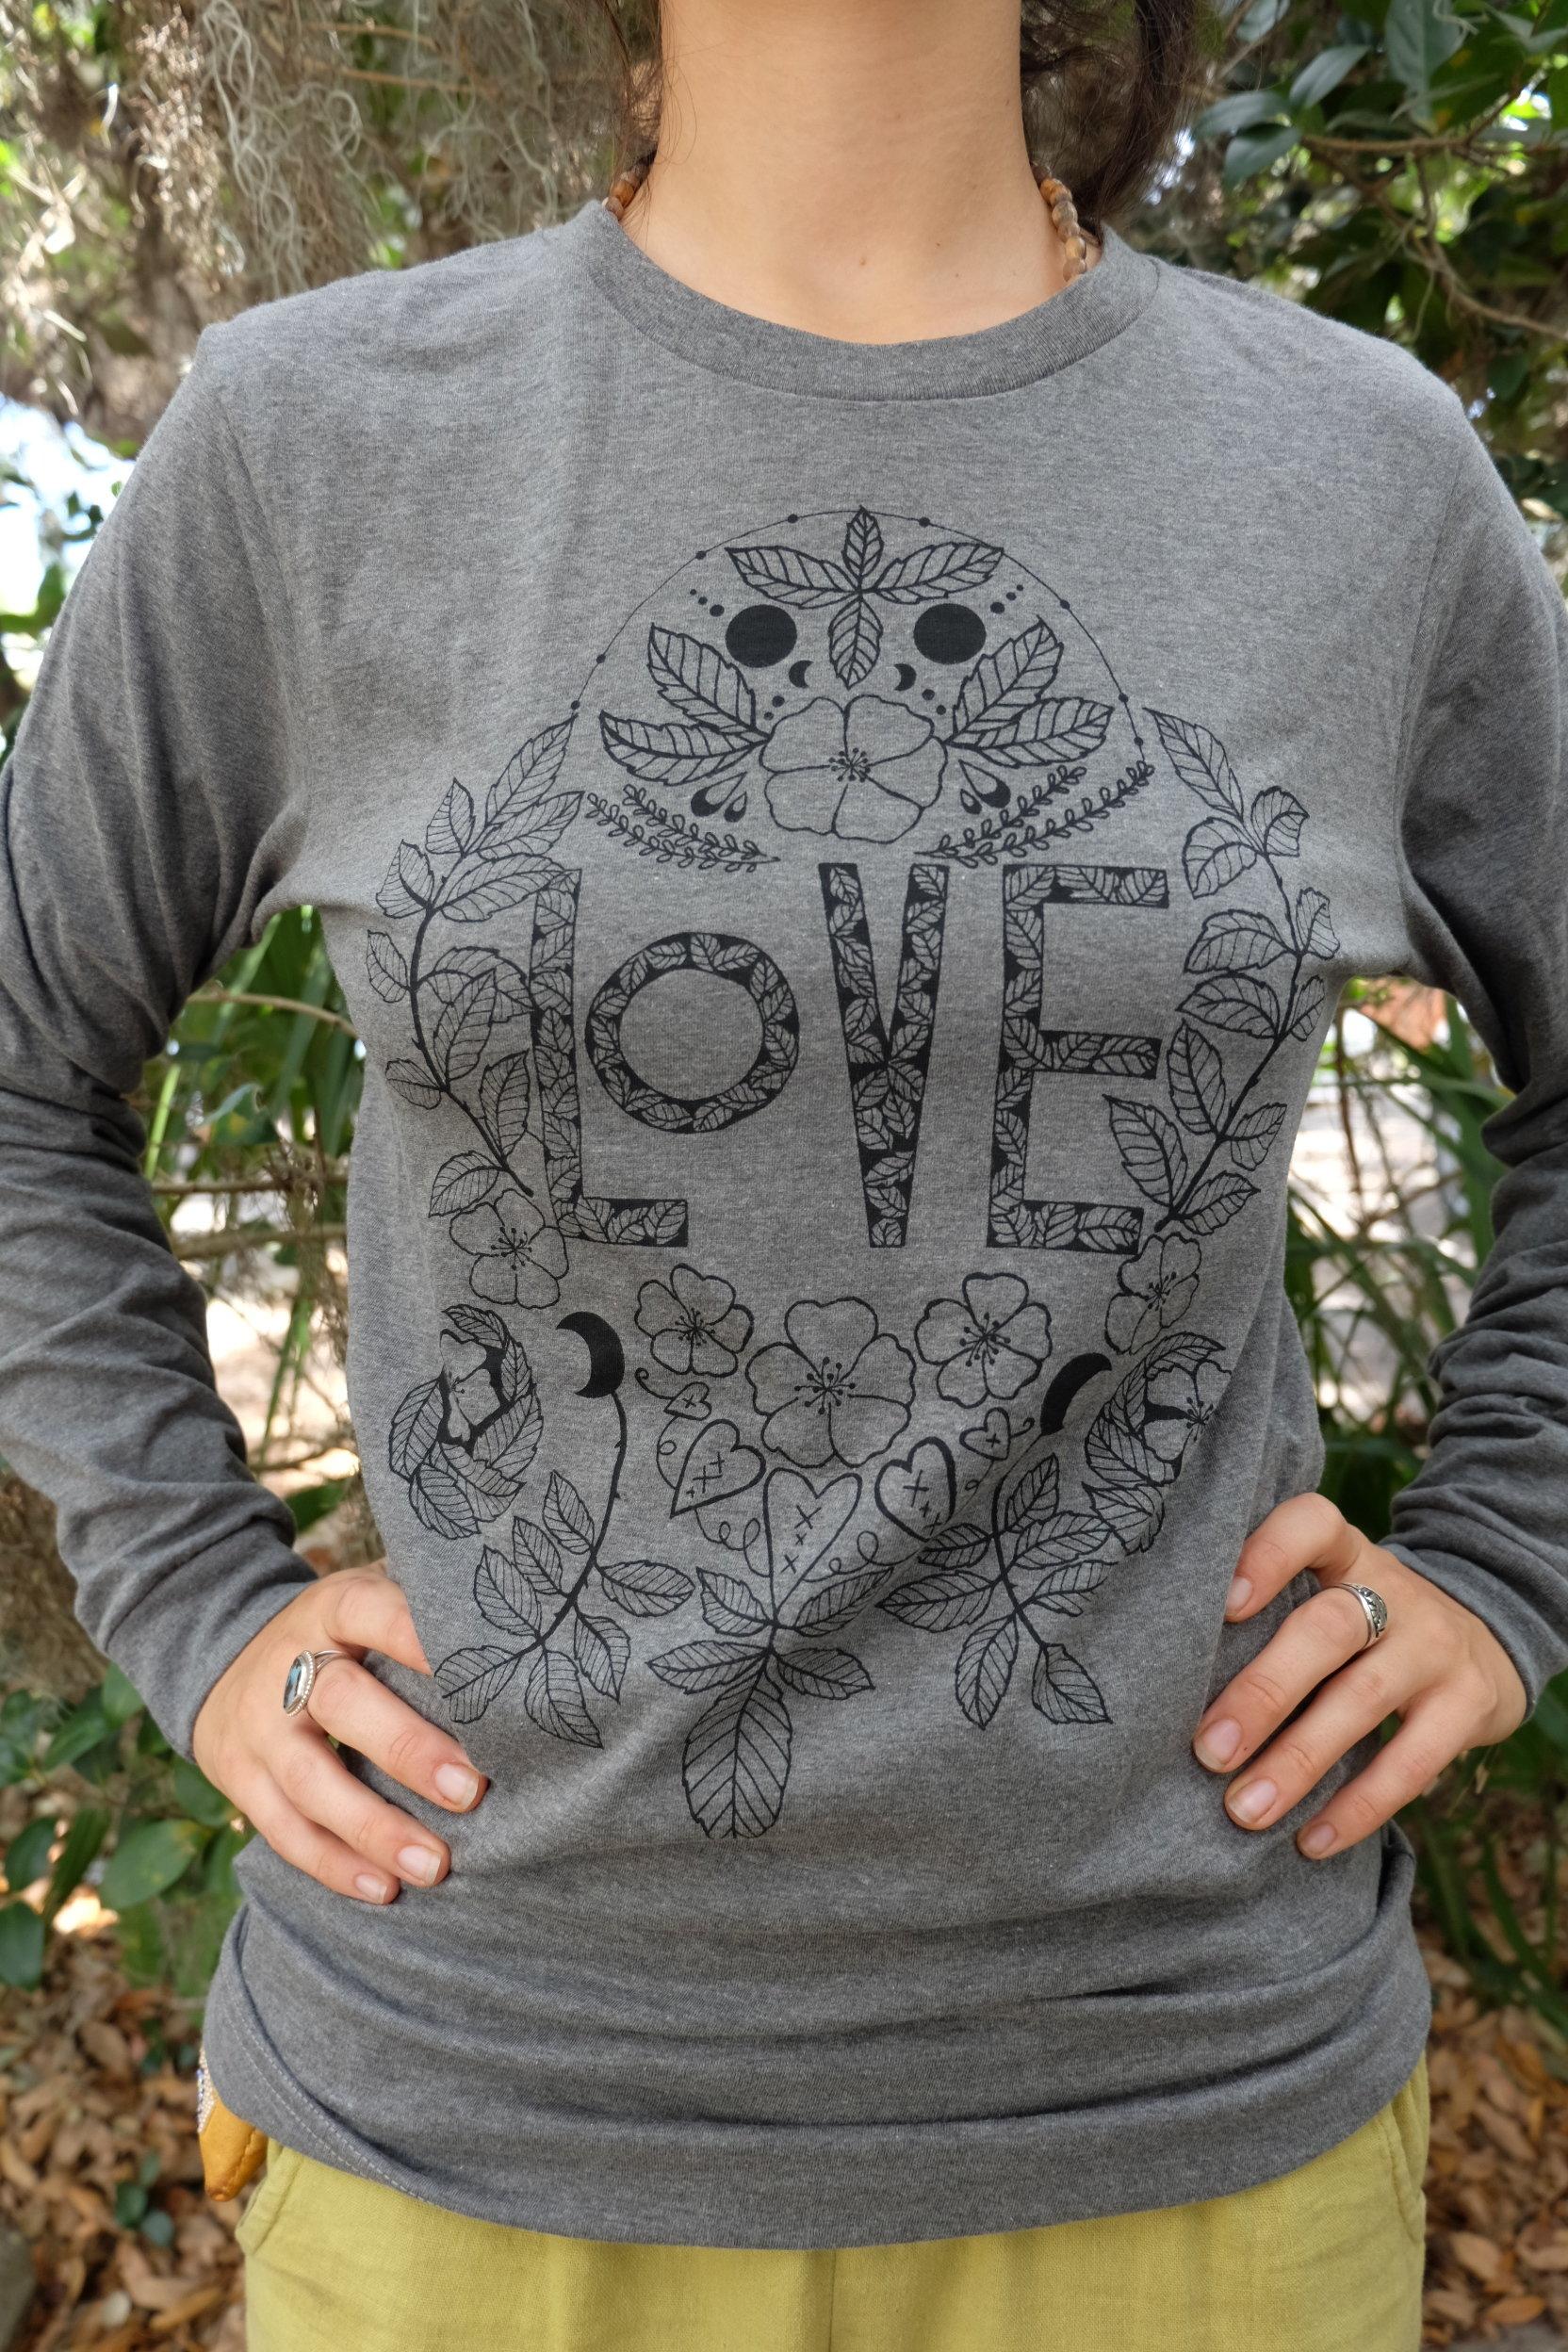 OGCP Unisex Long Sleeved Tee - Love, Wild Rose 00012